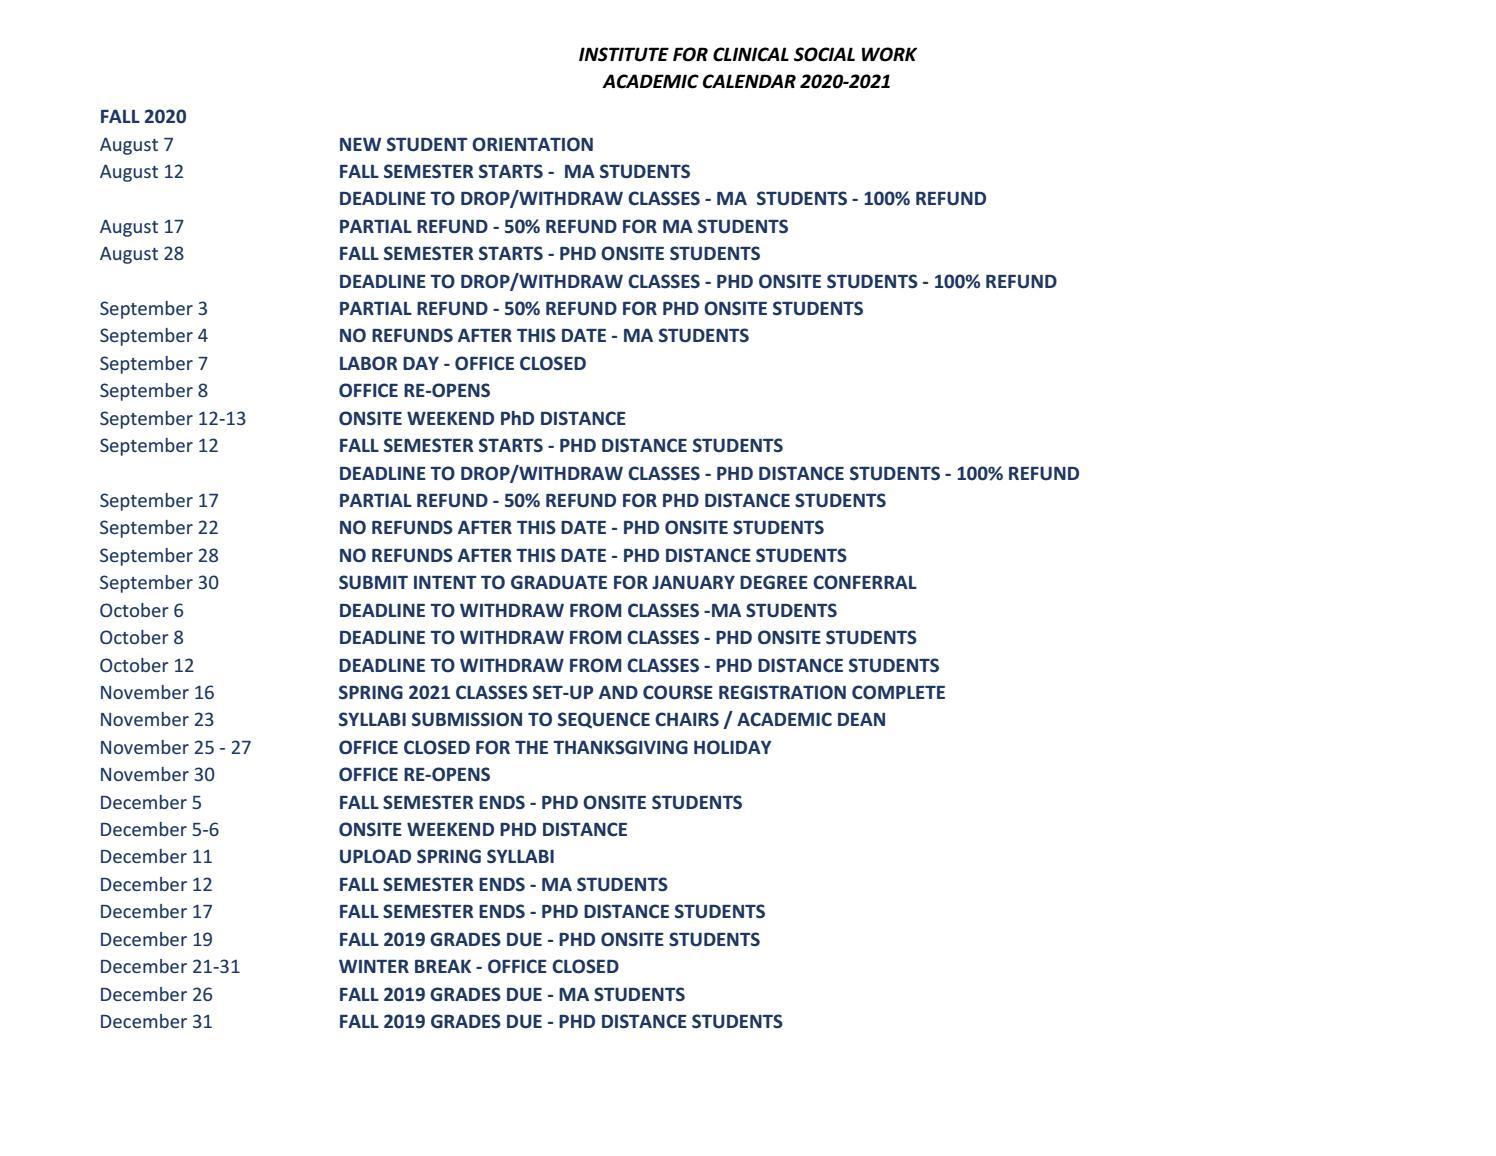 Isu Academic Calendar 2021 2020 21 Academic Calendar by ICSW   issuu